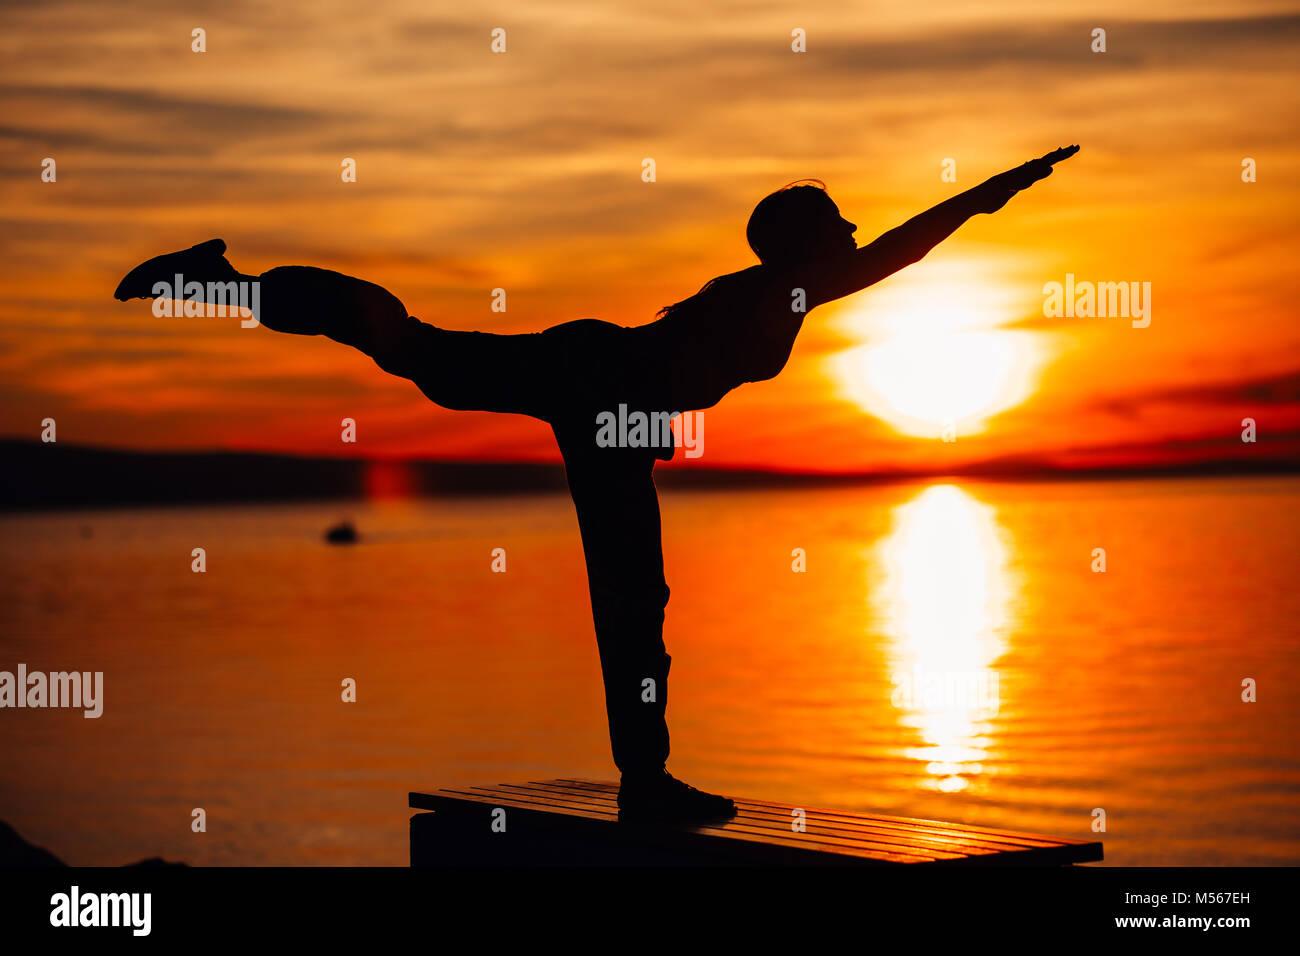 Carefree woman meditating in nature.Finding inner peace.Yoga practicing.Spiritual healing lifestyle.Enjoying peace,anti - Stock Image